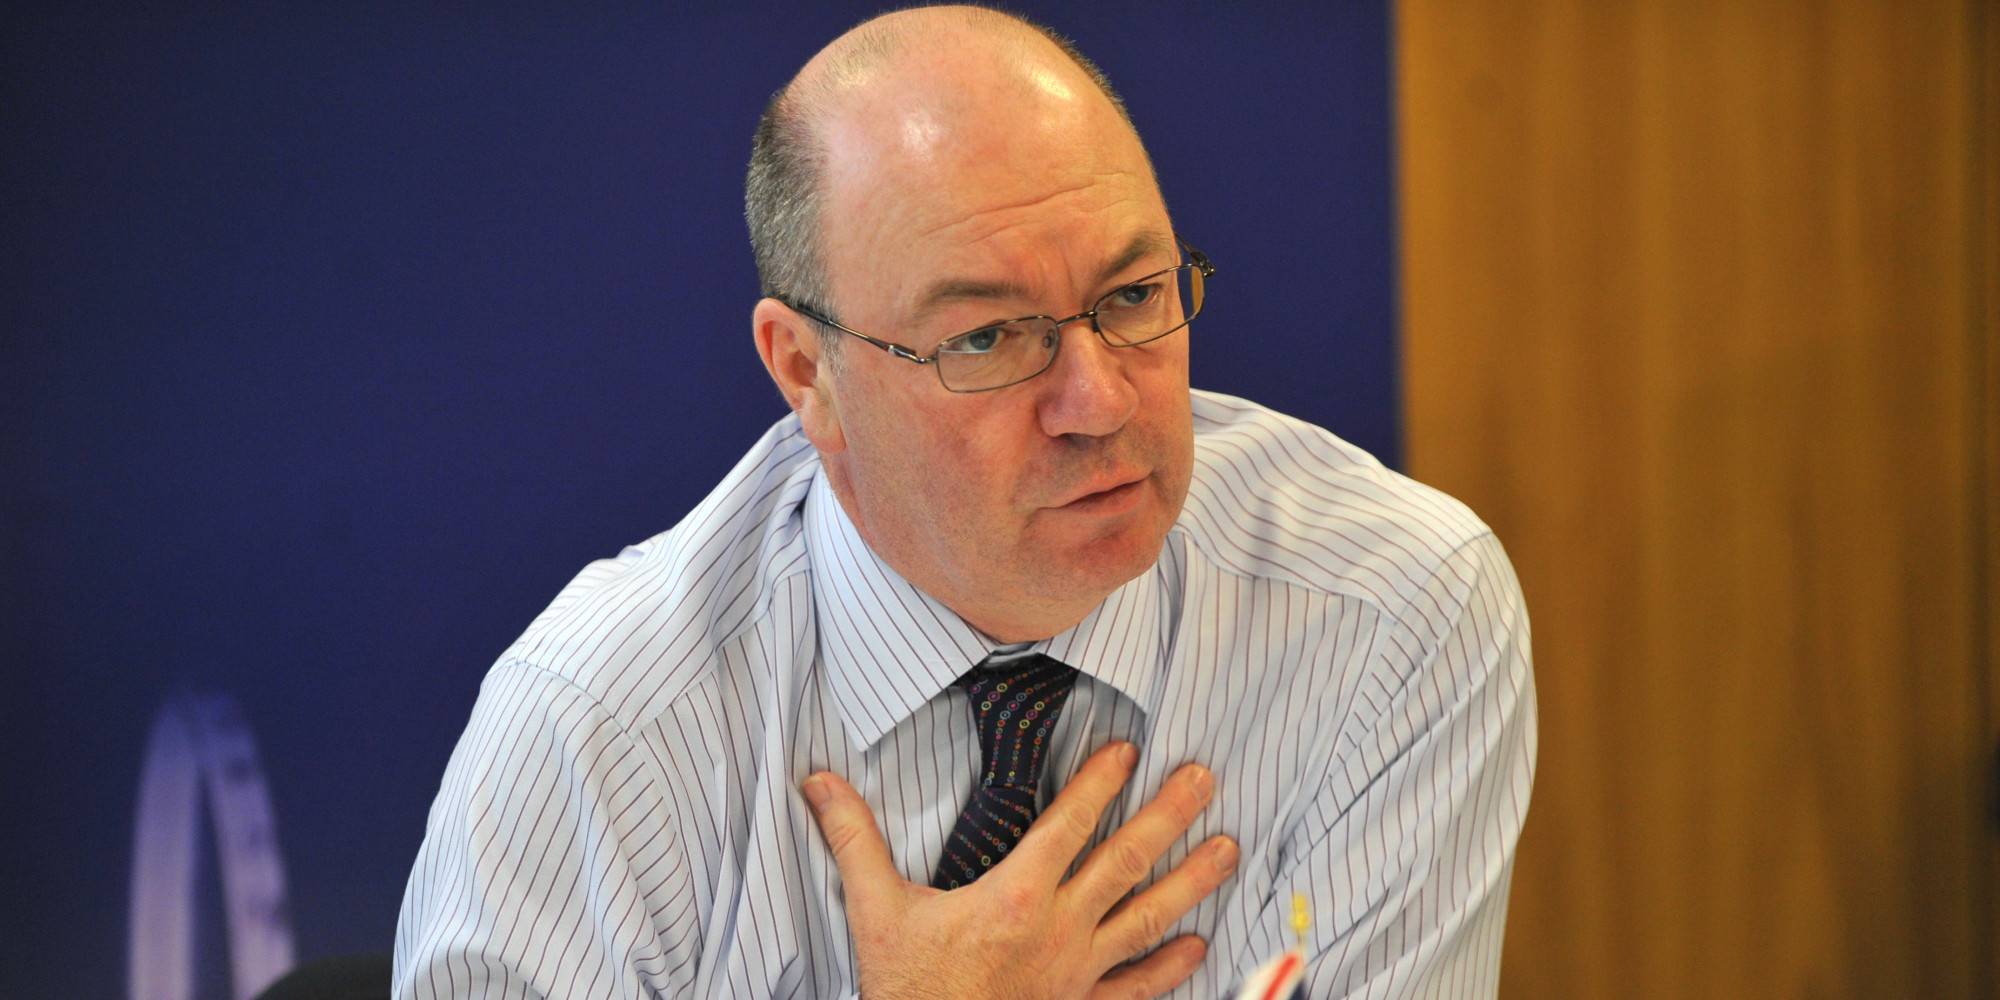 MP Alistair Burt